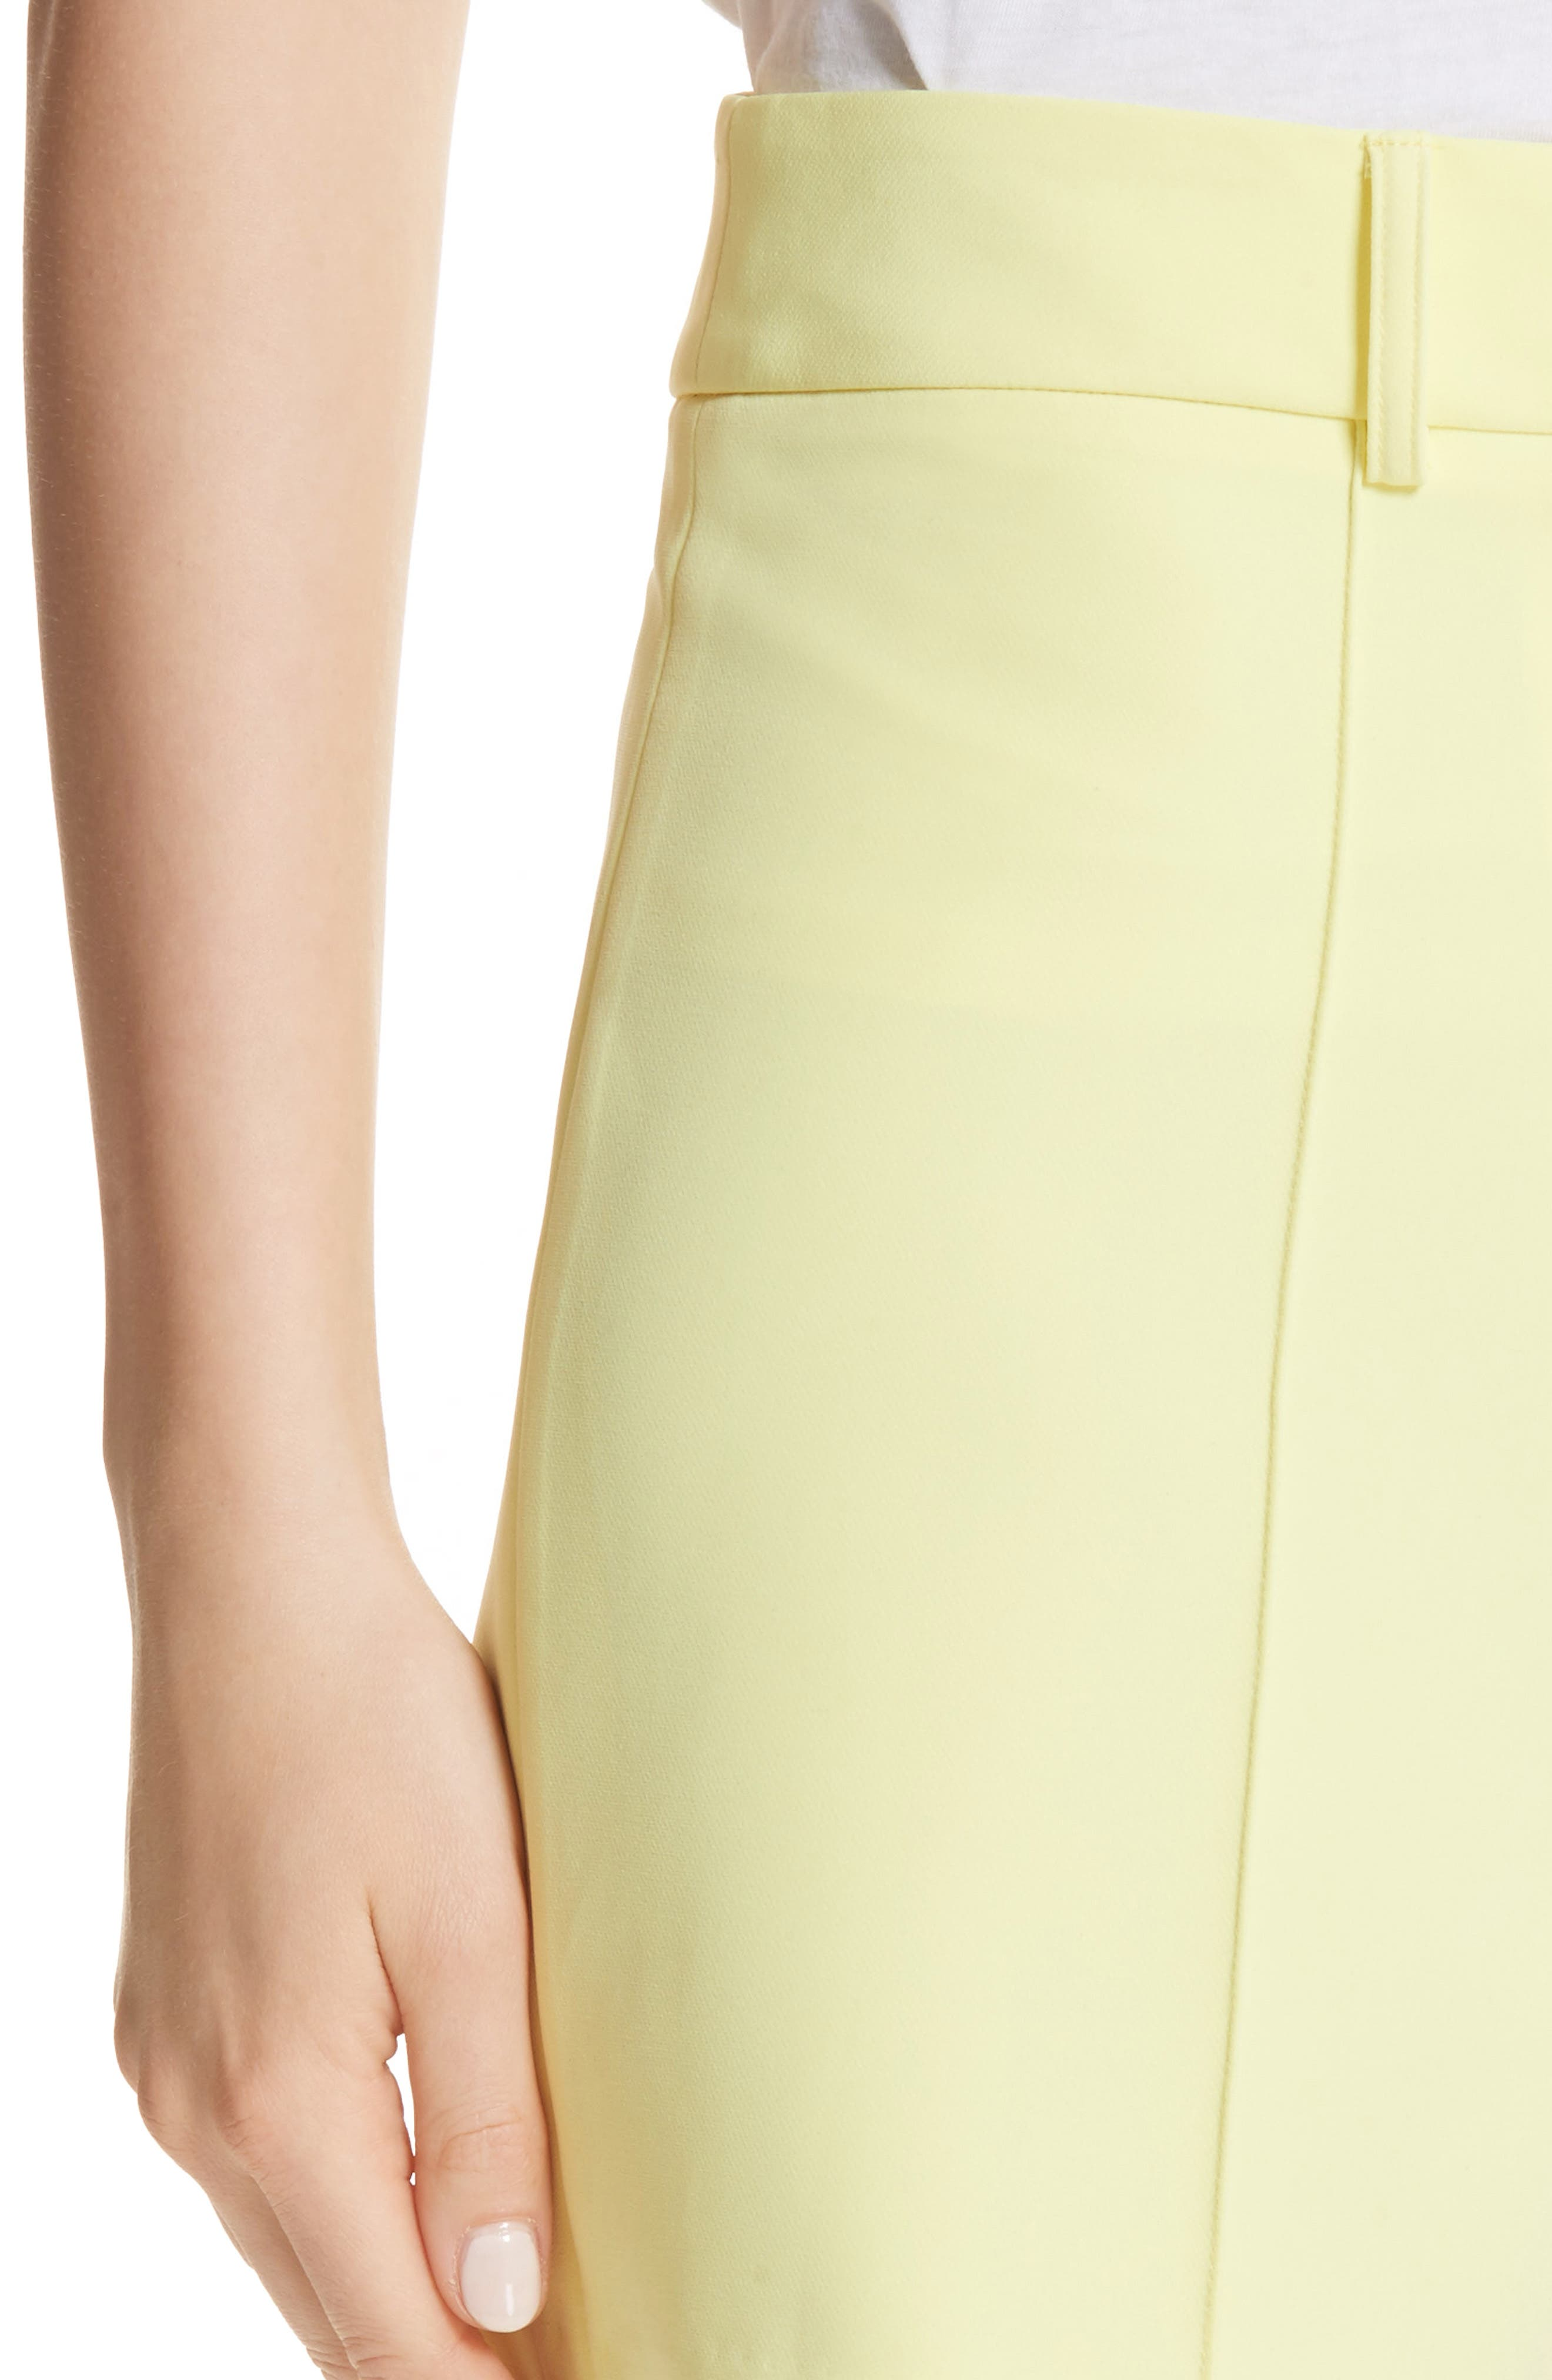 Hayden Trouser Shorts,                             Alternate thumbnail 4, color,                             Lemon Yellow